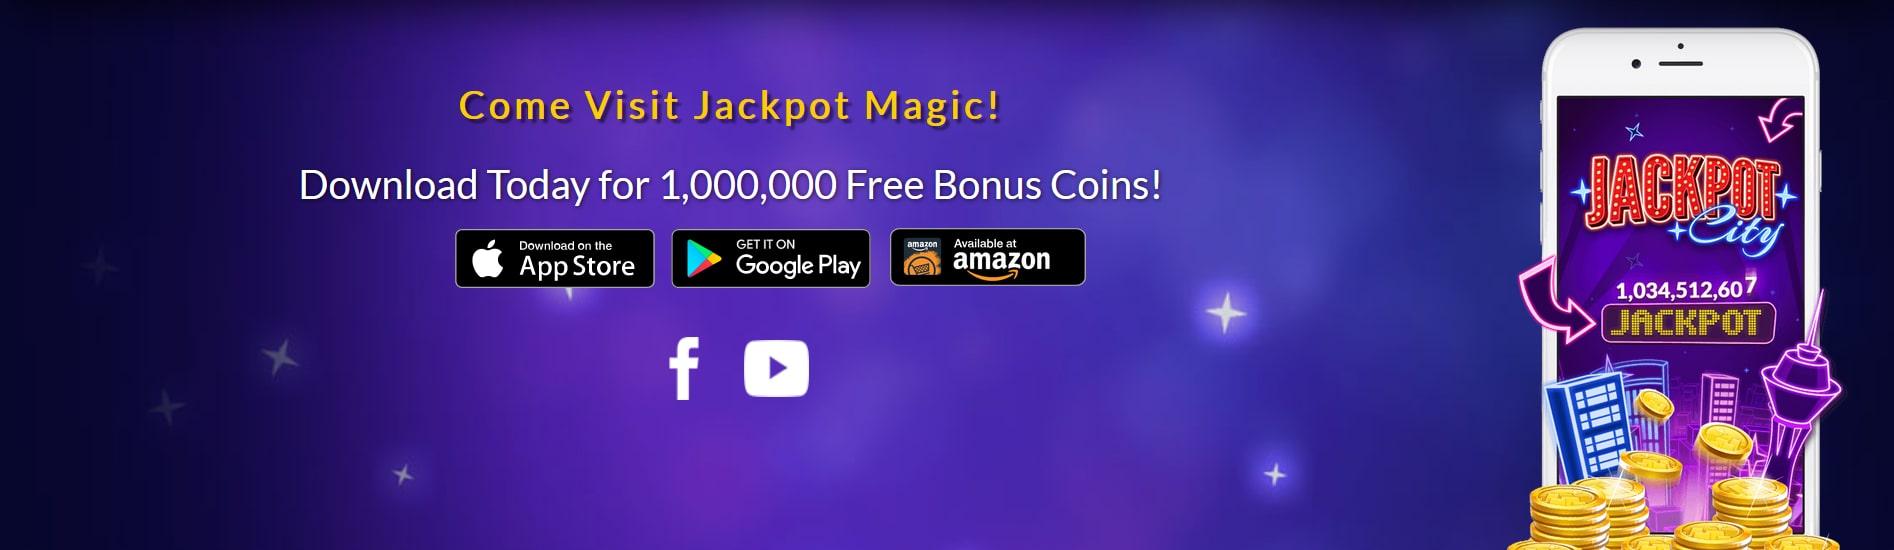 Jackpot Magic Slots Mobile App